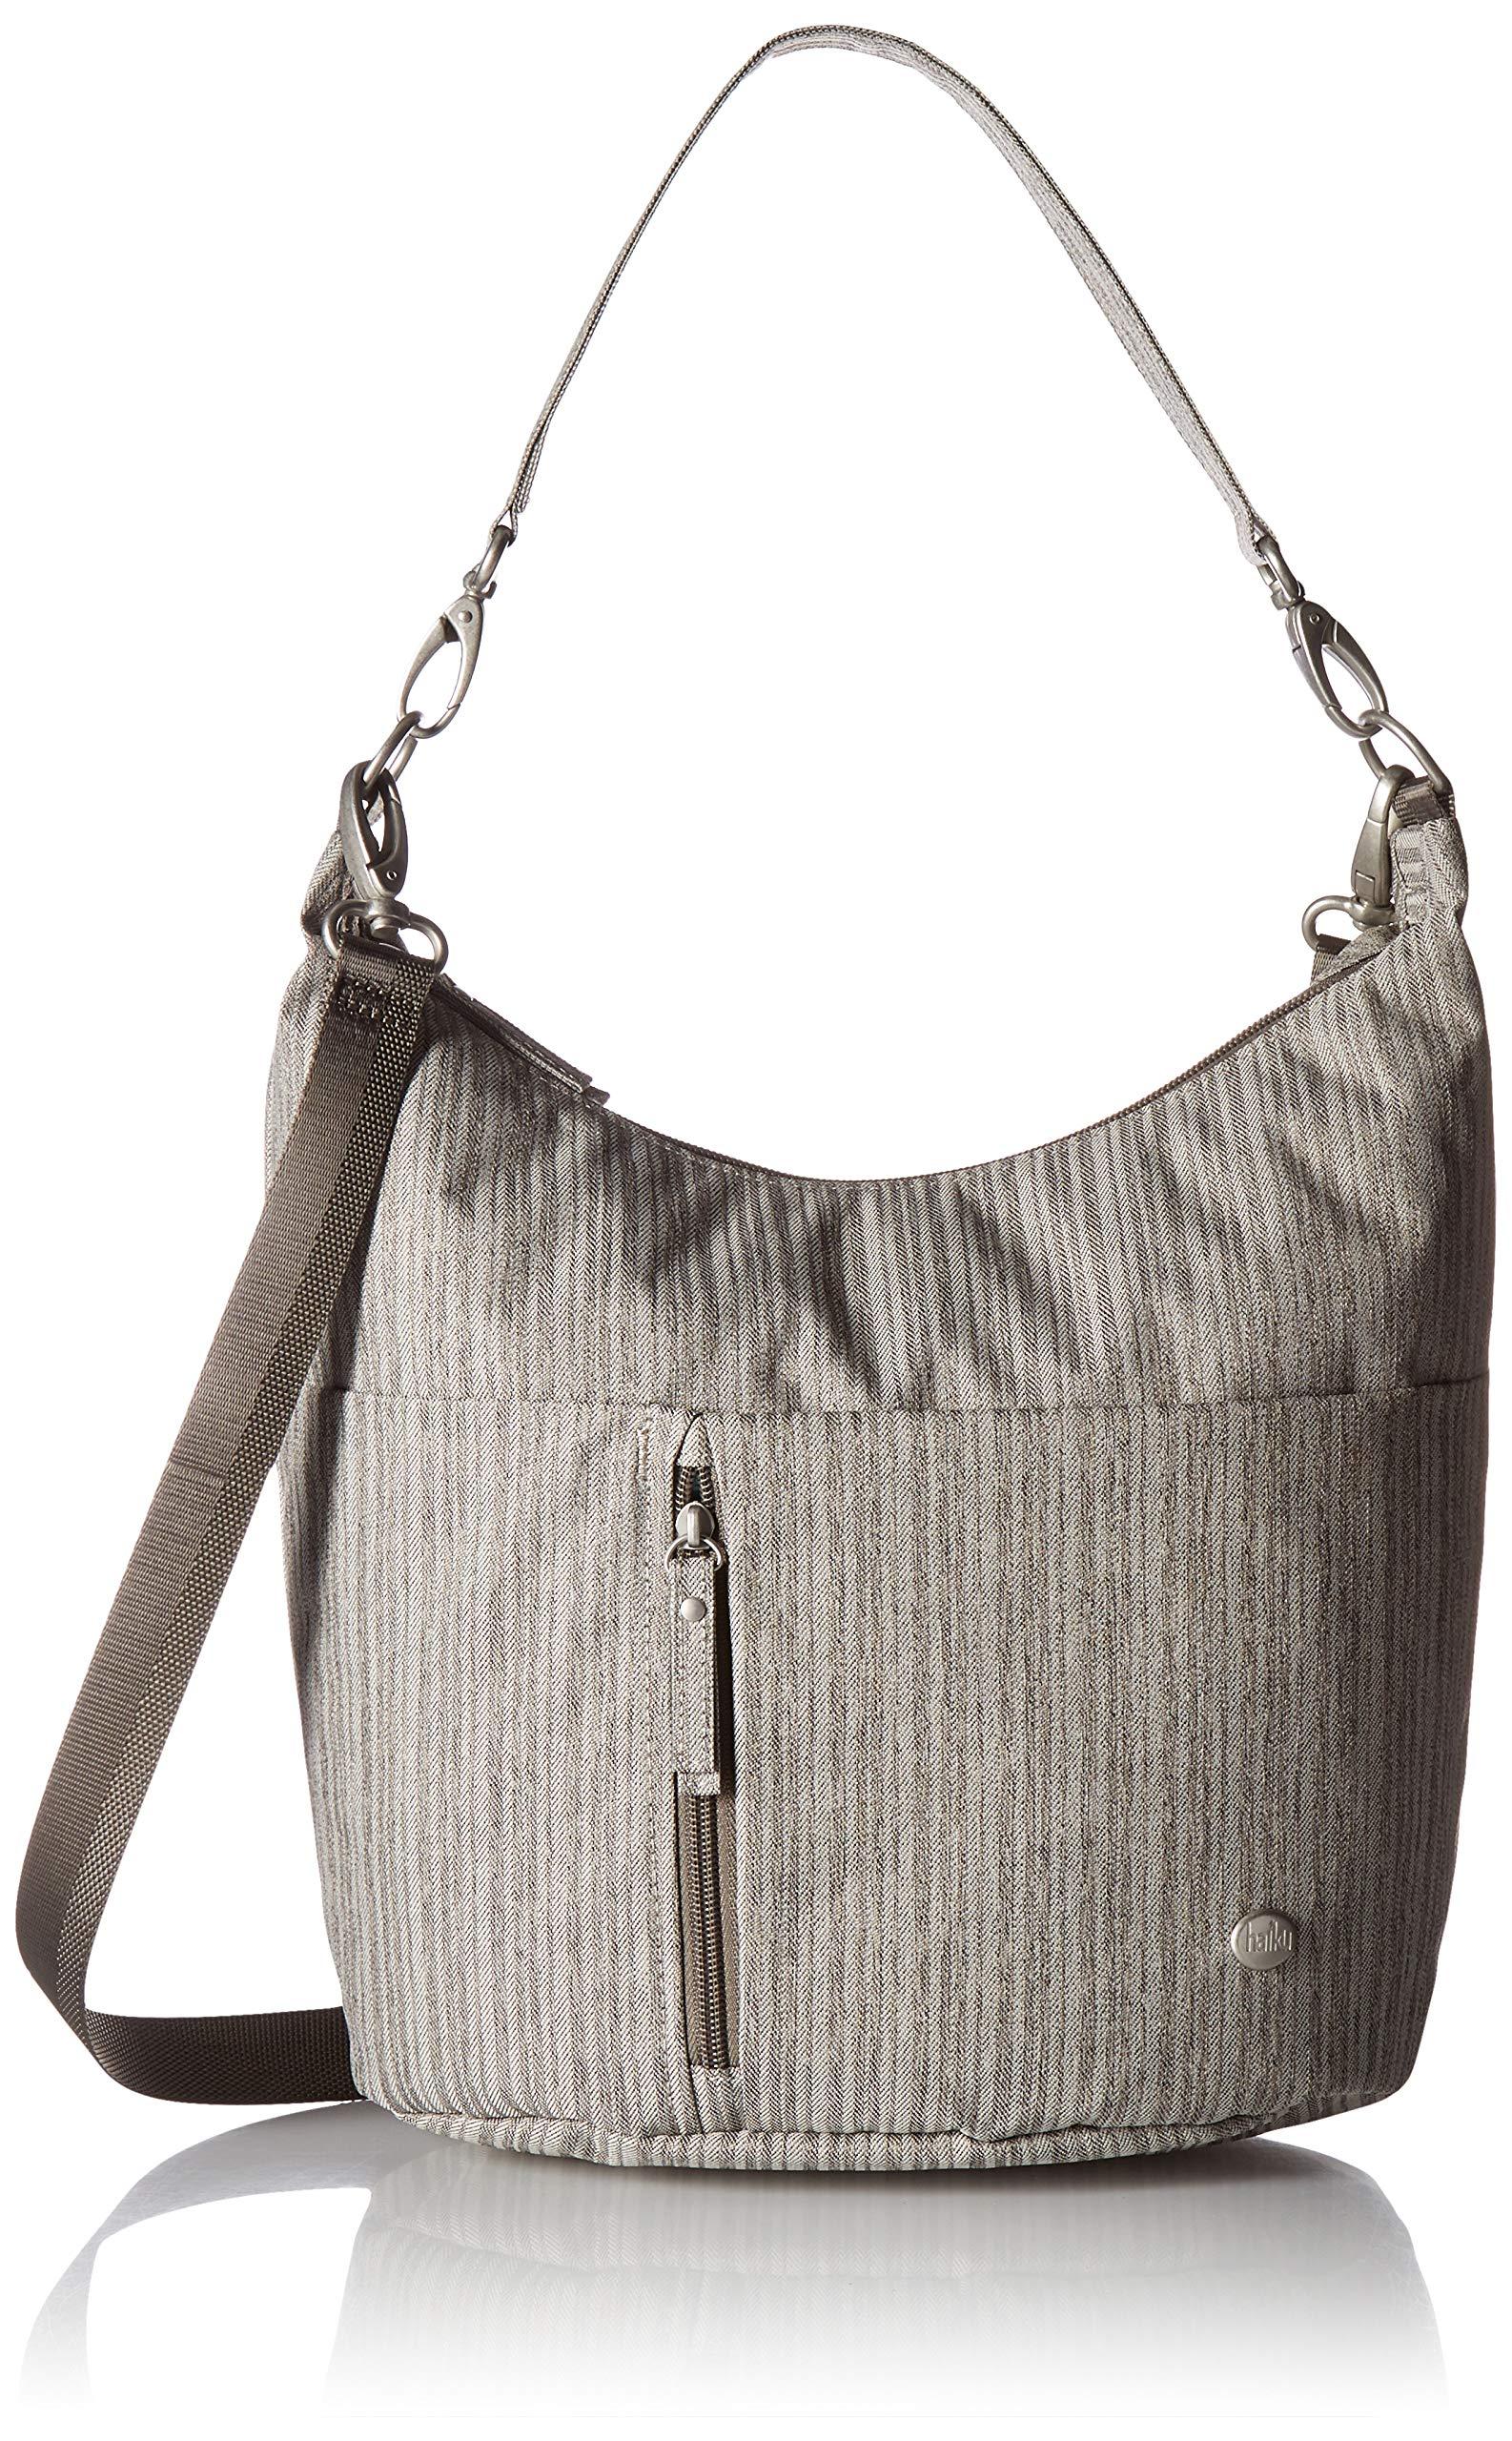 HAIKU Women's Ascend Hobo Shoulder Bag, 10'' x 10.75'' x 7.5'', Grey